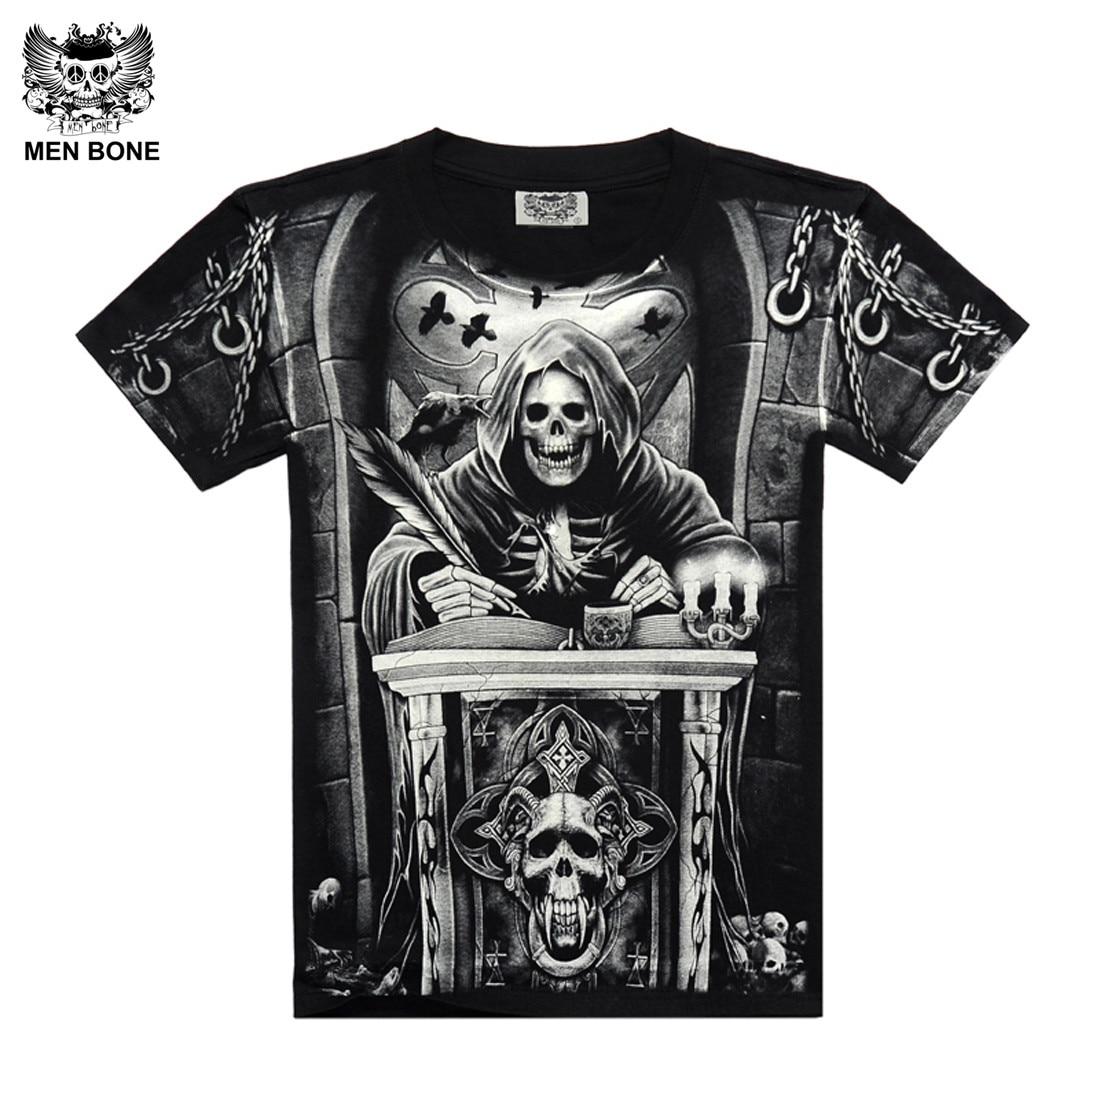 [Män ben] Heavy Metal Style Grim Reaper Skull Tshirt Svart Svart Print shirt Hip Hop Street Rock heavy metal sleeve